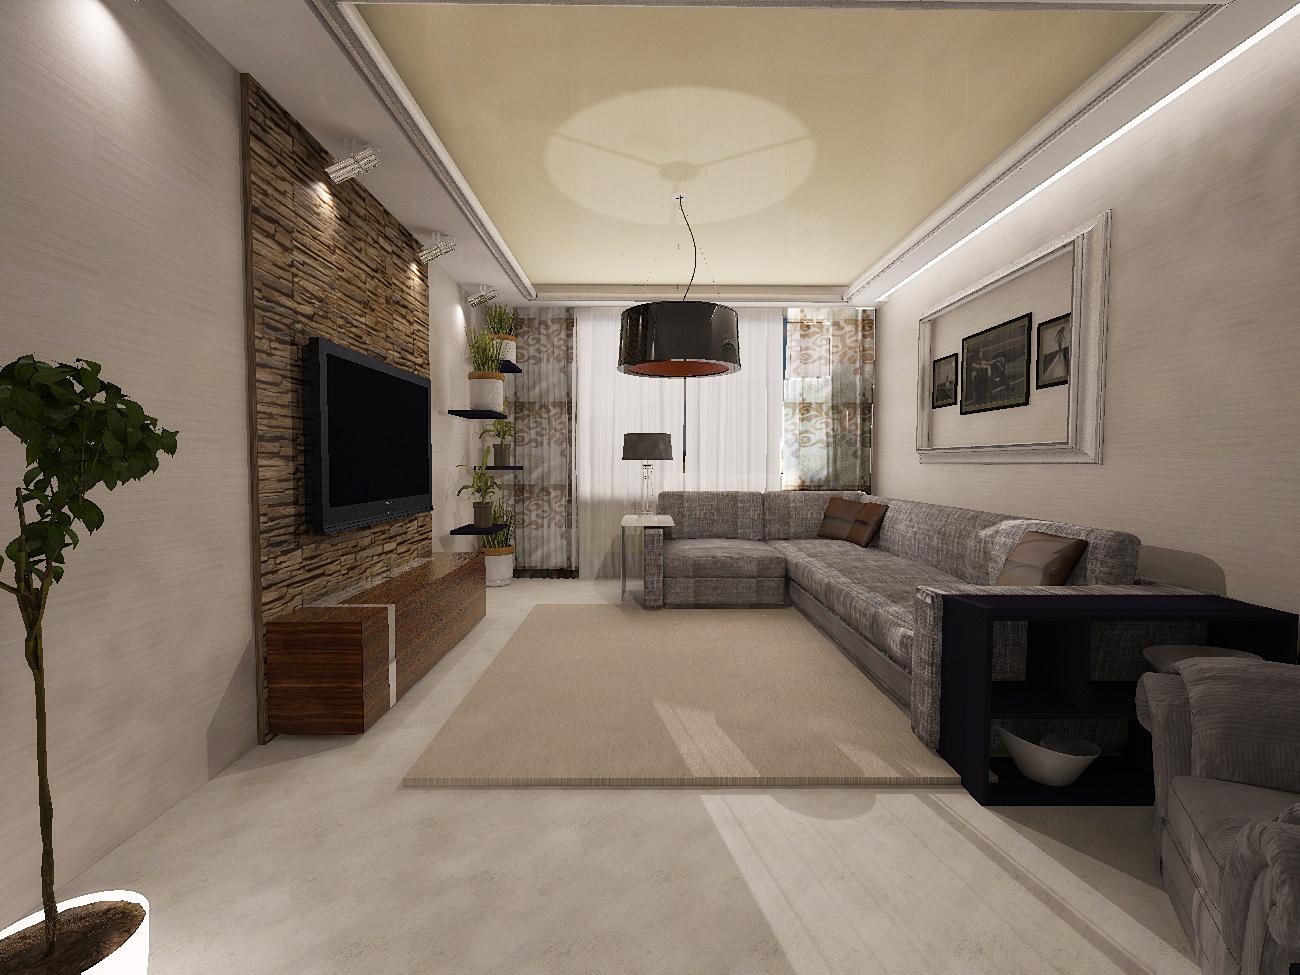 дизайн зала в квартире 20 кв. м фото